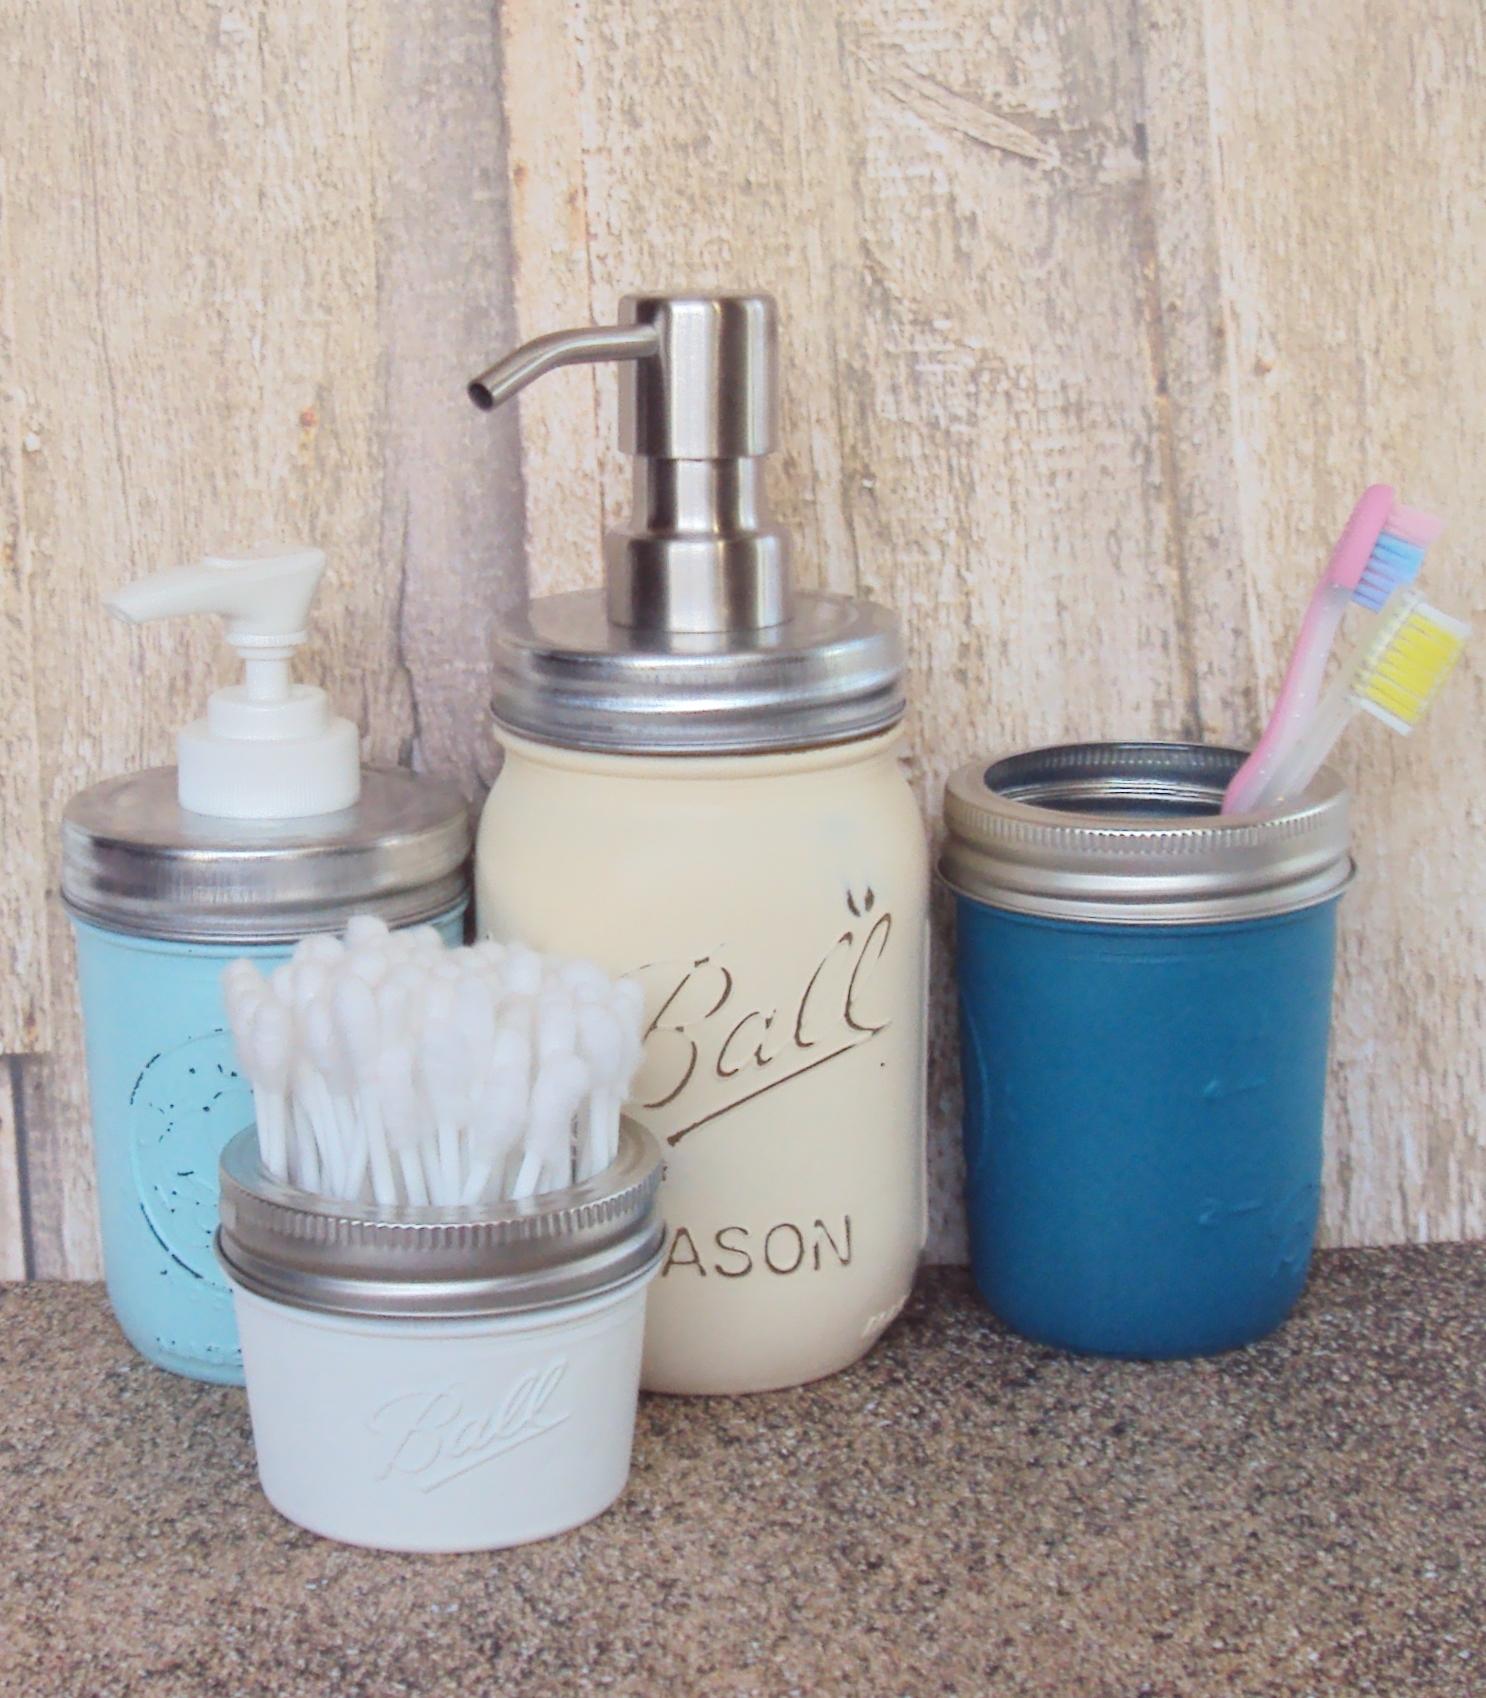 beach themed mason jar set with foaming soap dispenser and lotion dispenser mogul. Black Bedroom Furniture Sets. Home Design Ideas